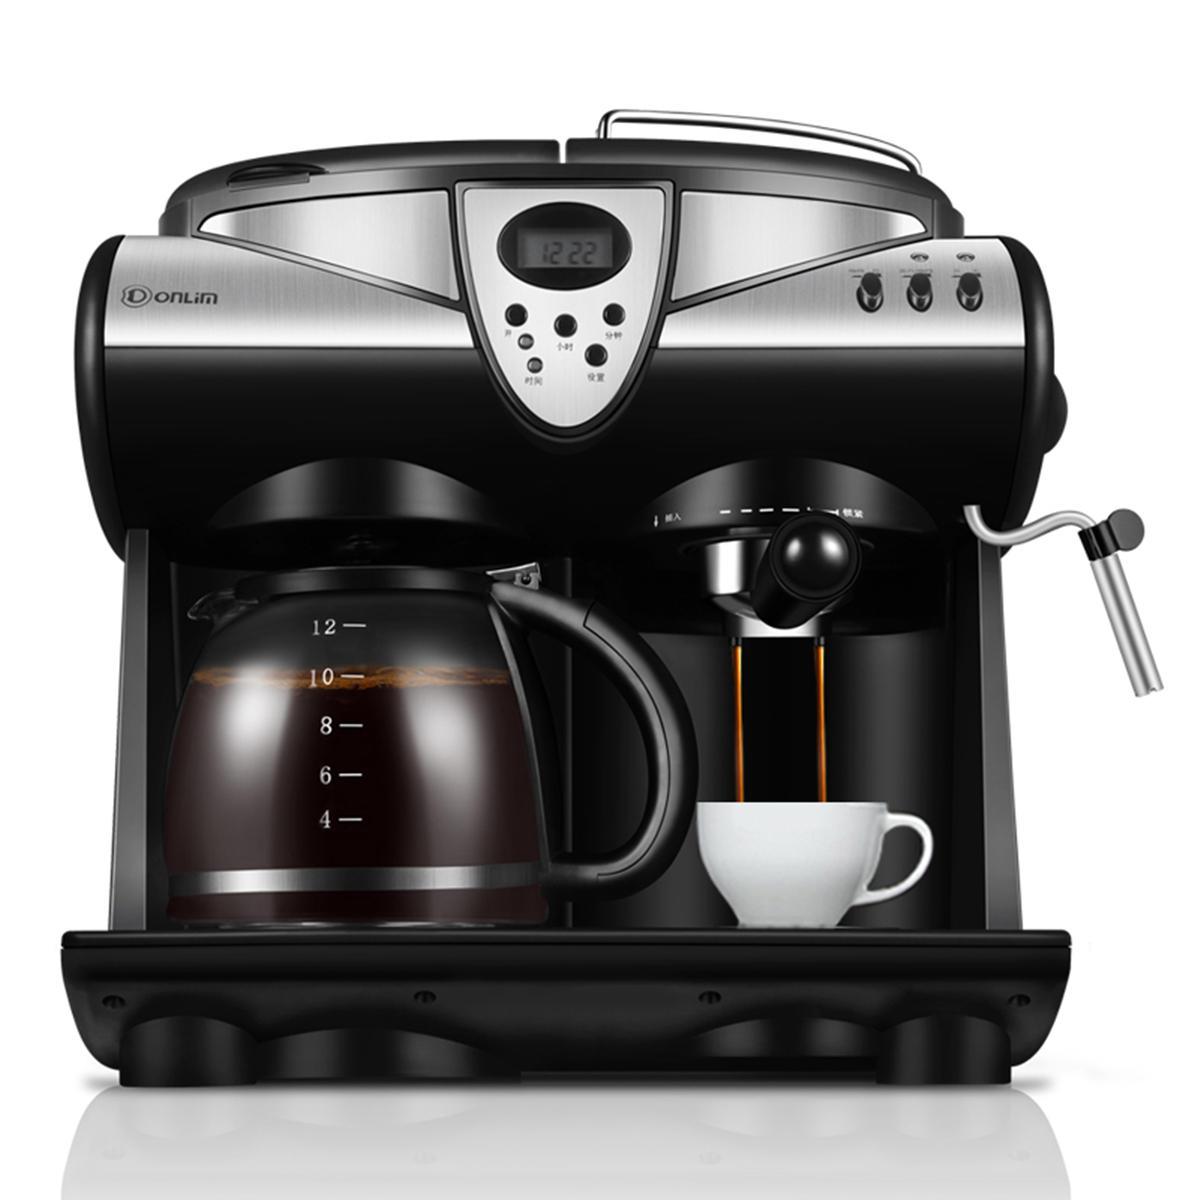 Donlim Dl Kf7001 Espresso Coffee